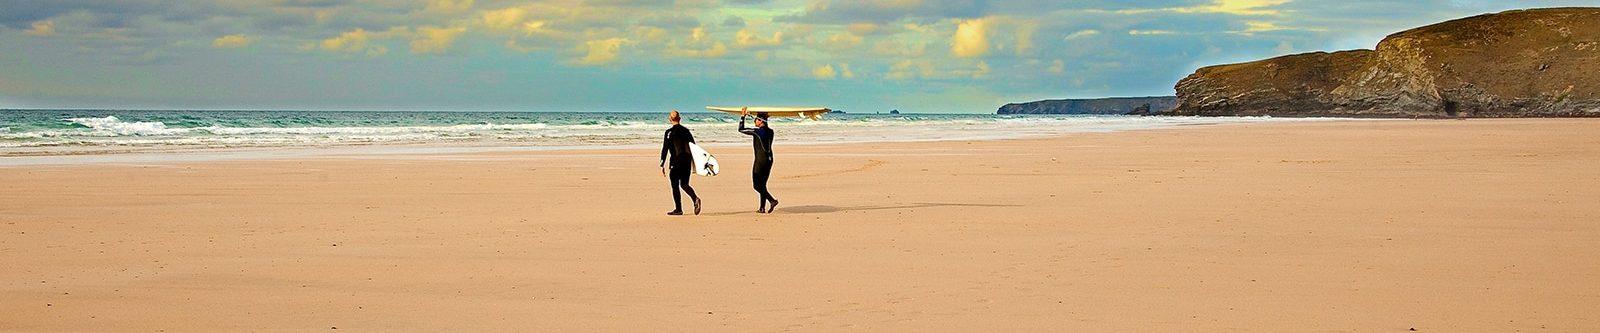 surfers walking to sea